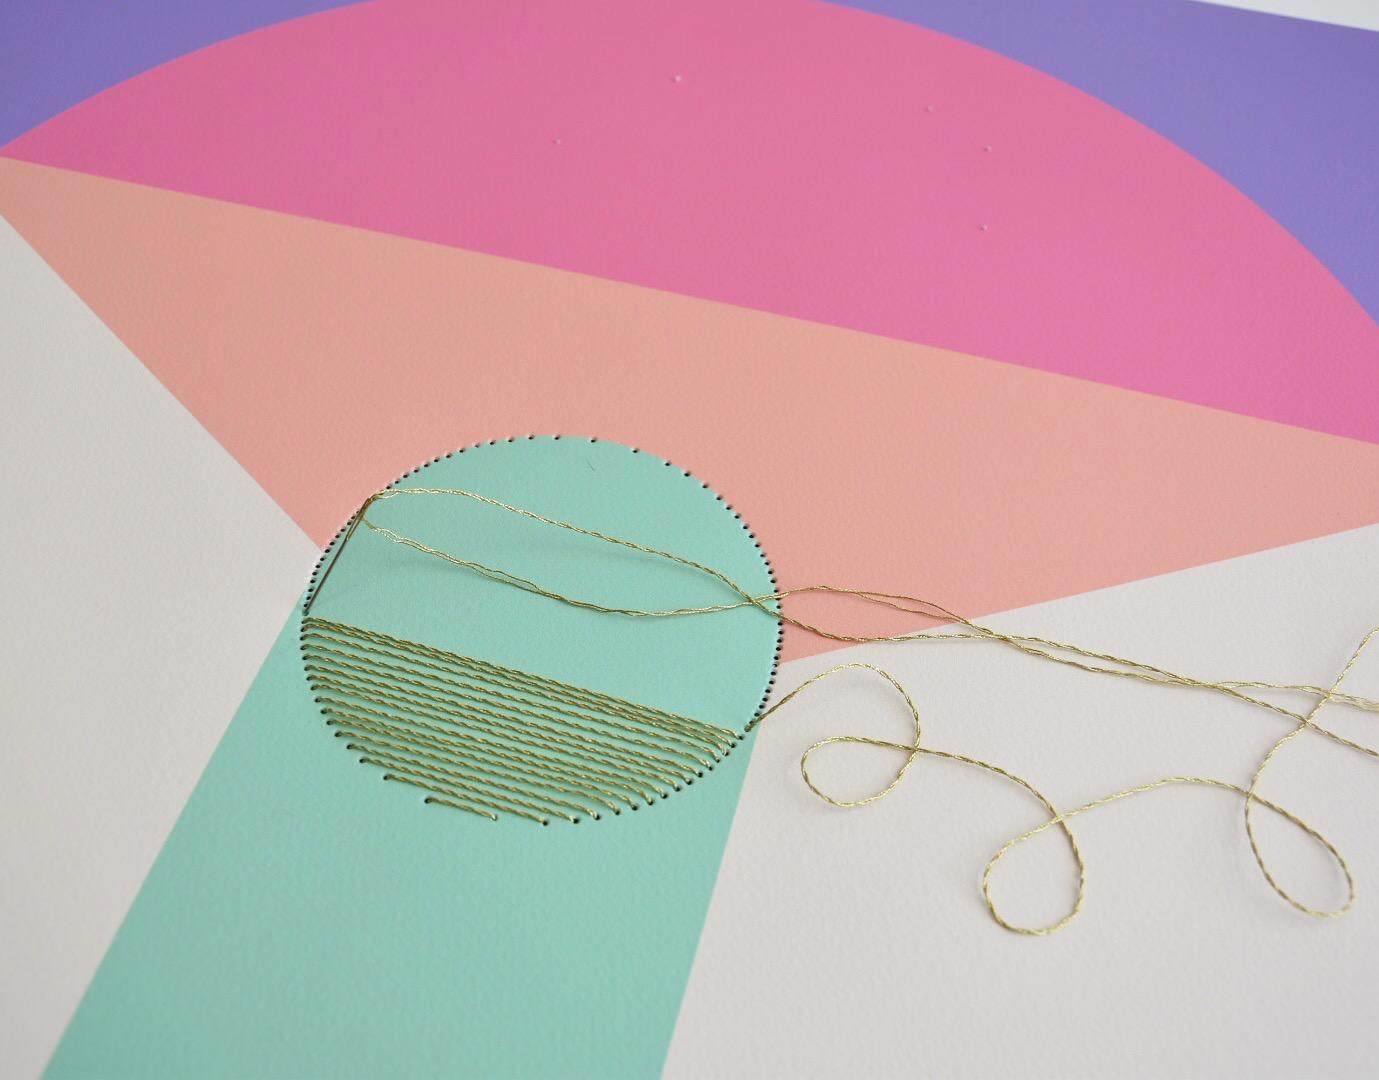 hand-stitching-embellishment